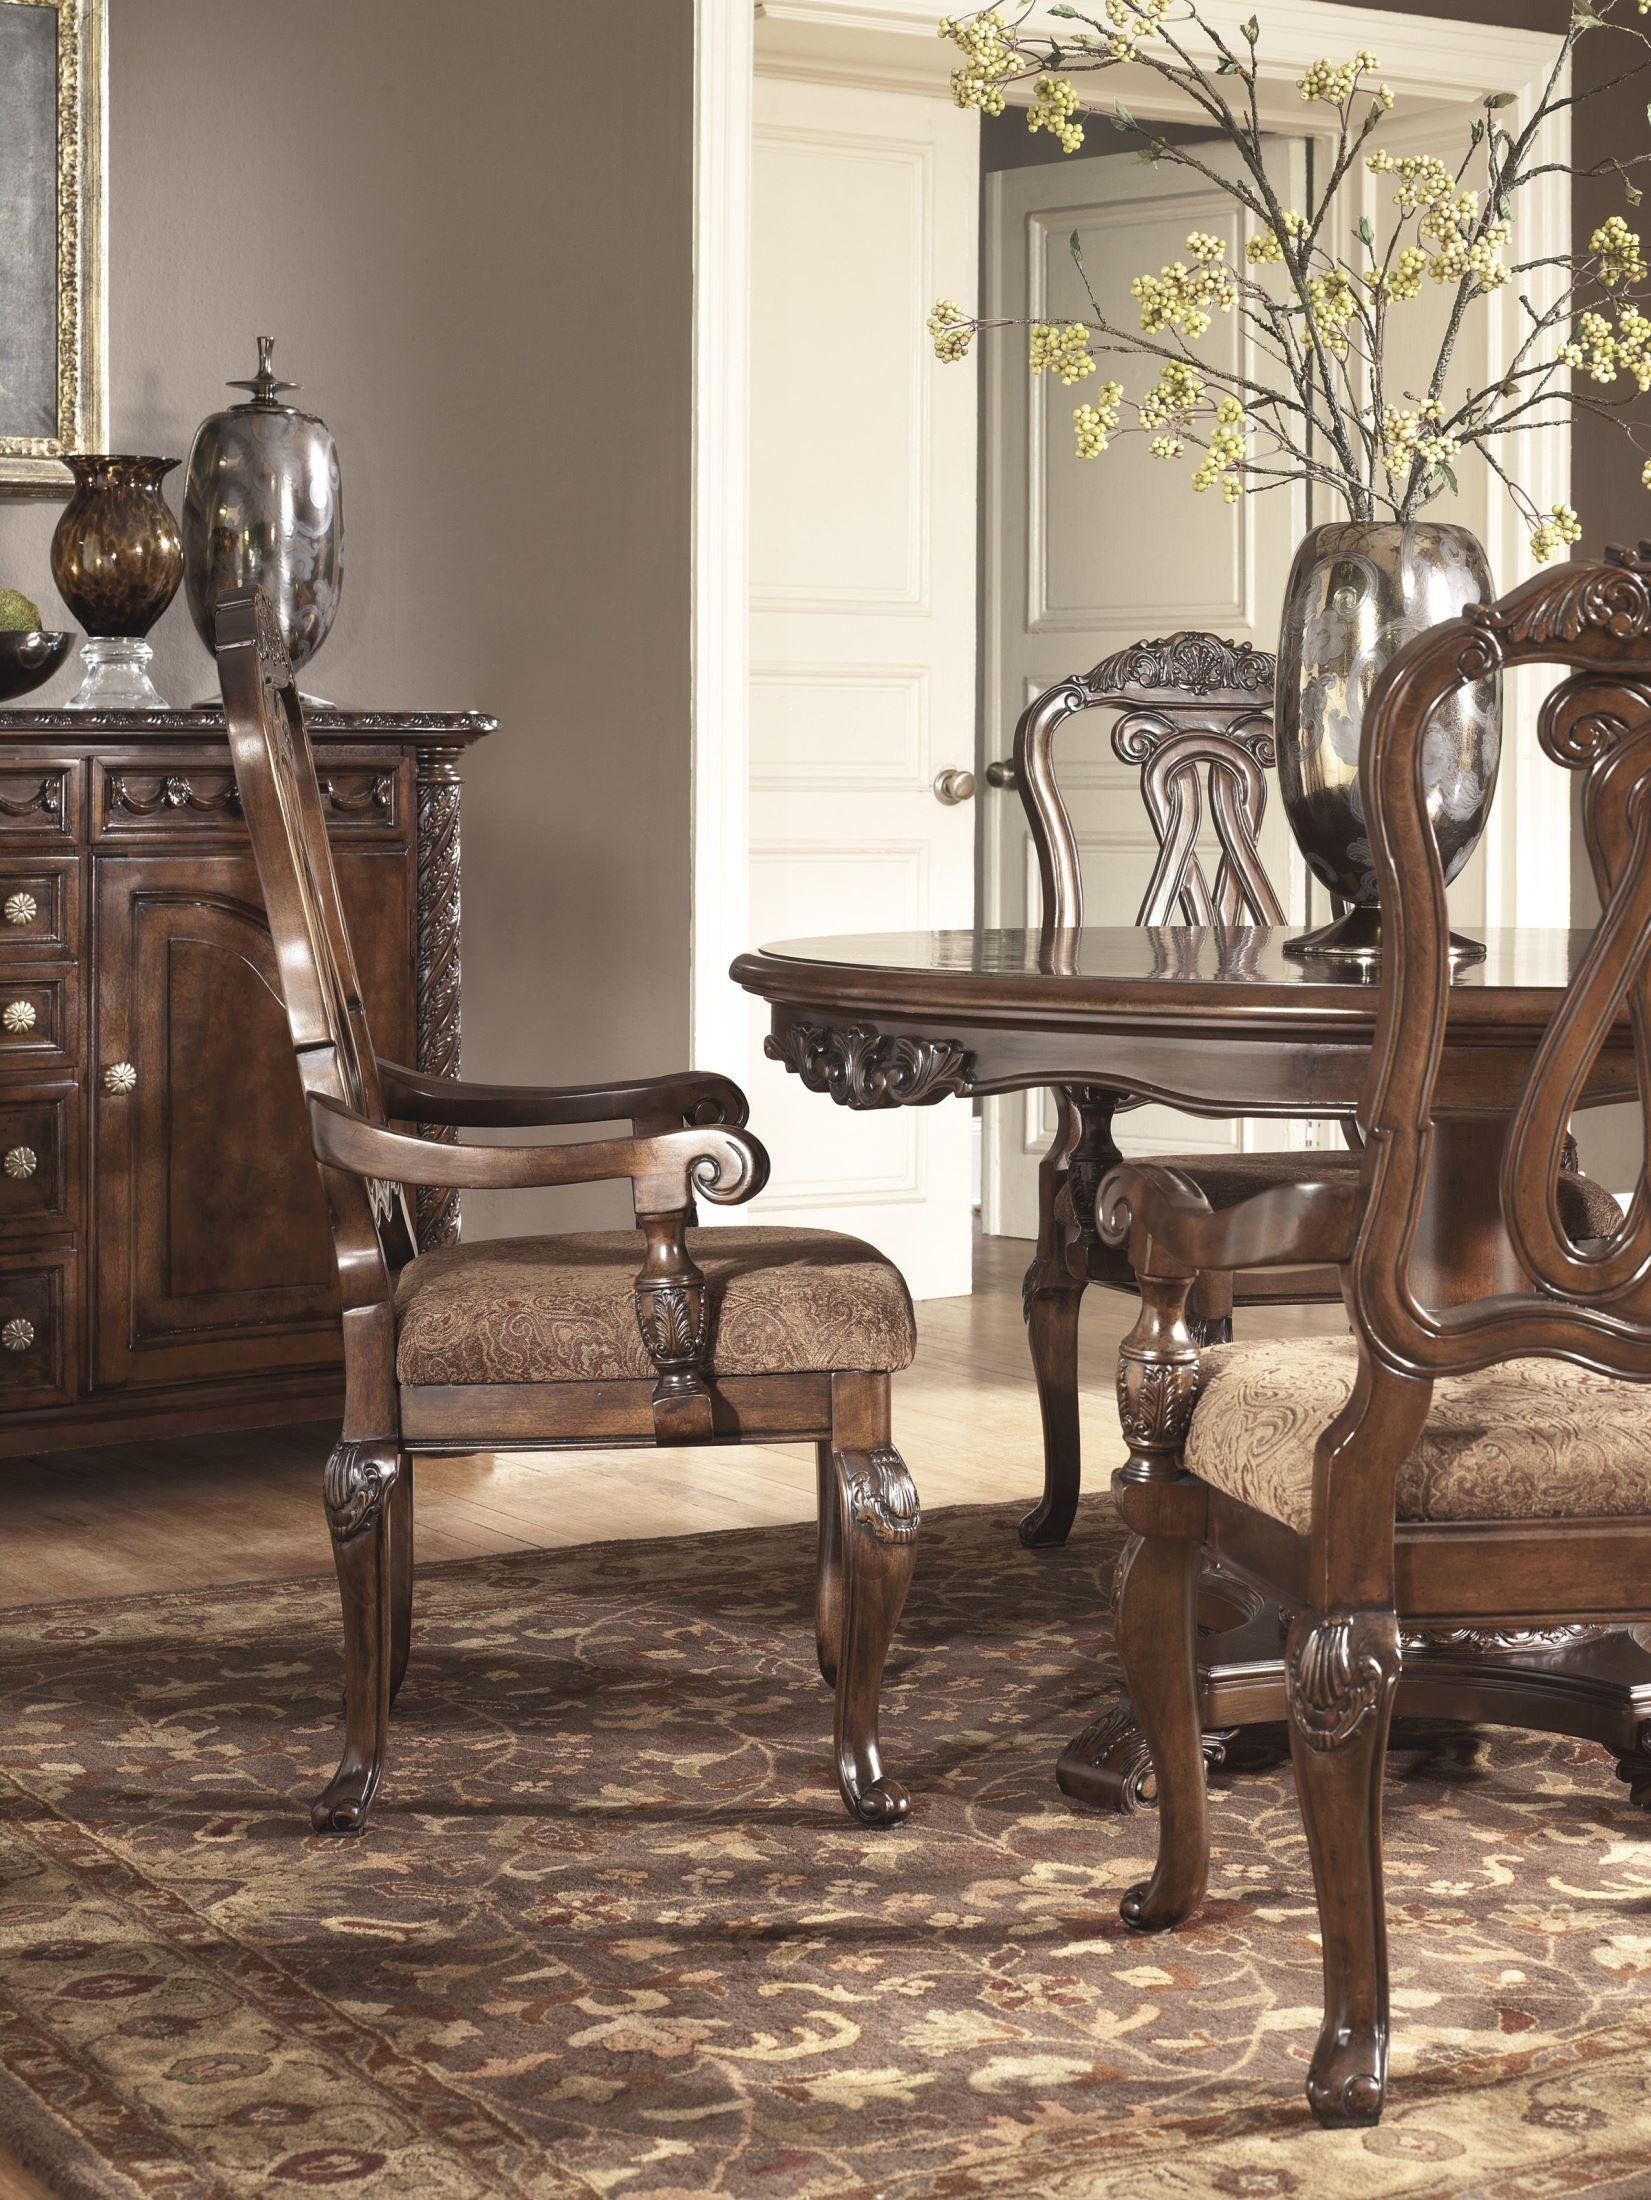 North shore round dining room set